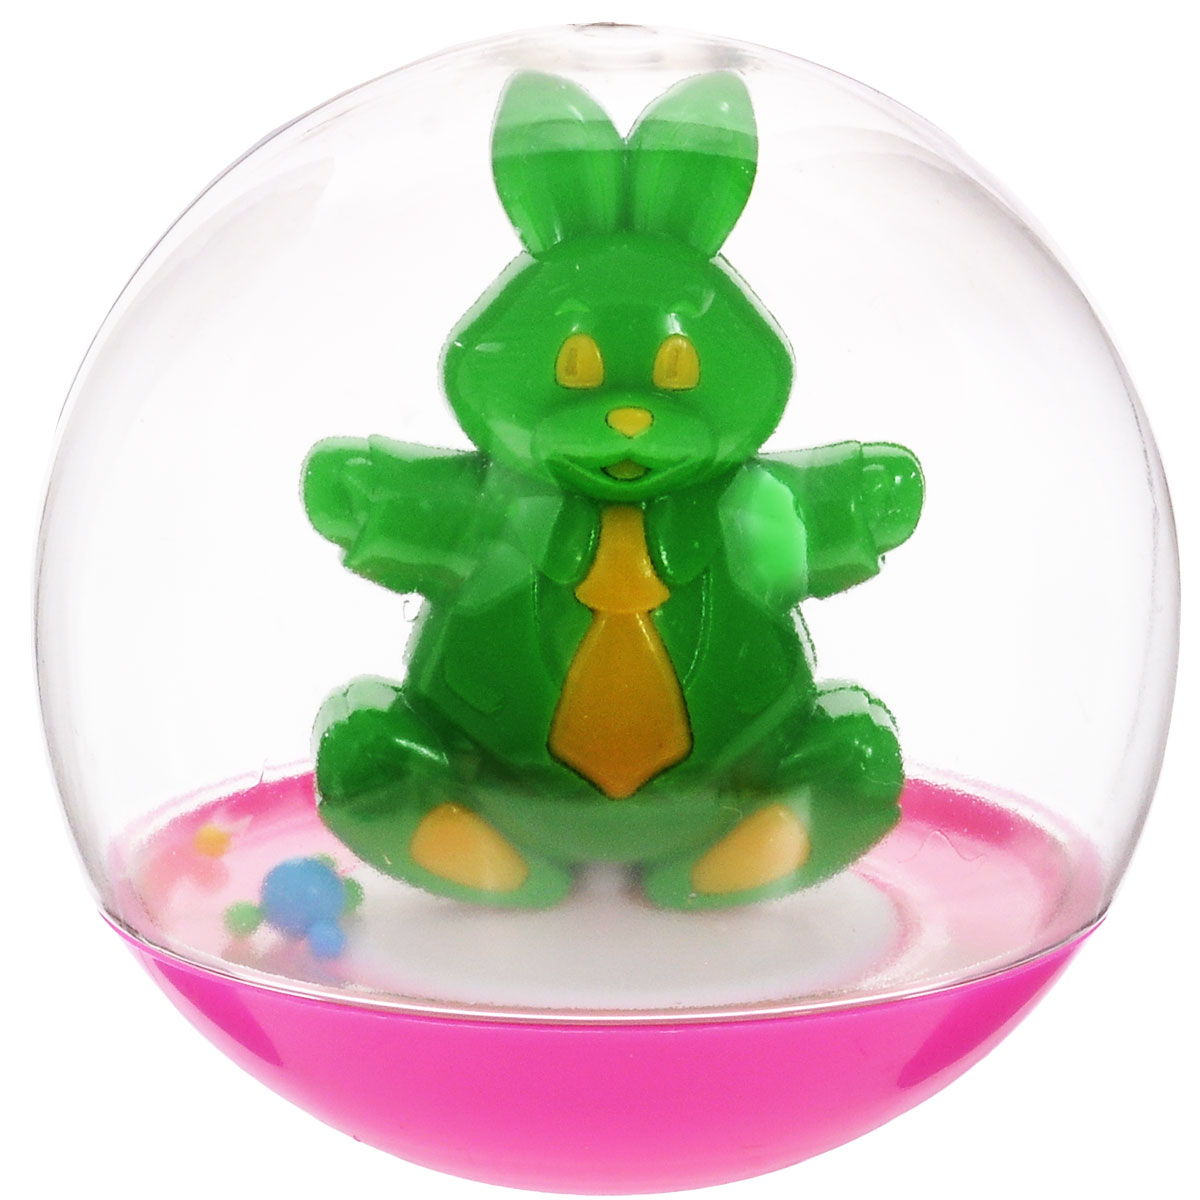 "Stellar Погремушка-неваляшка ""Заяц"", 10 см, цвет: зеленый"